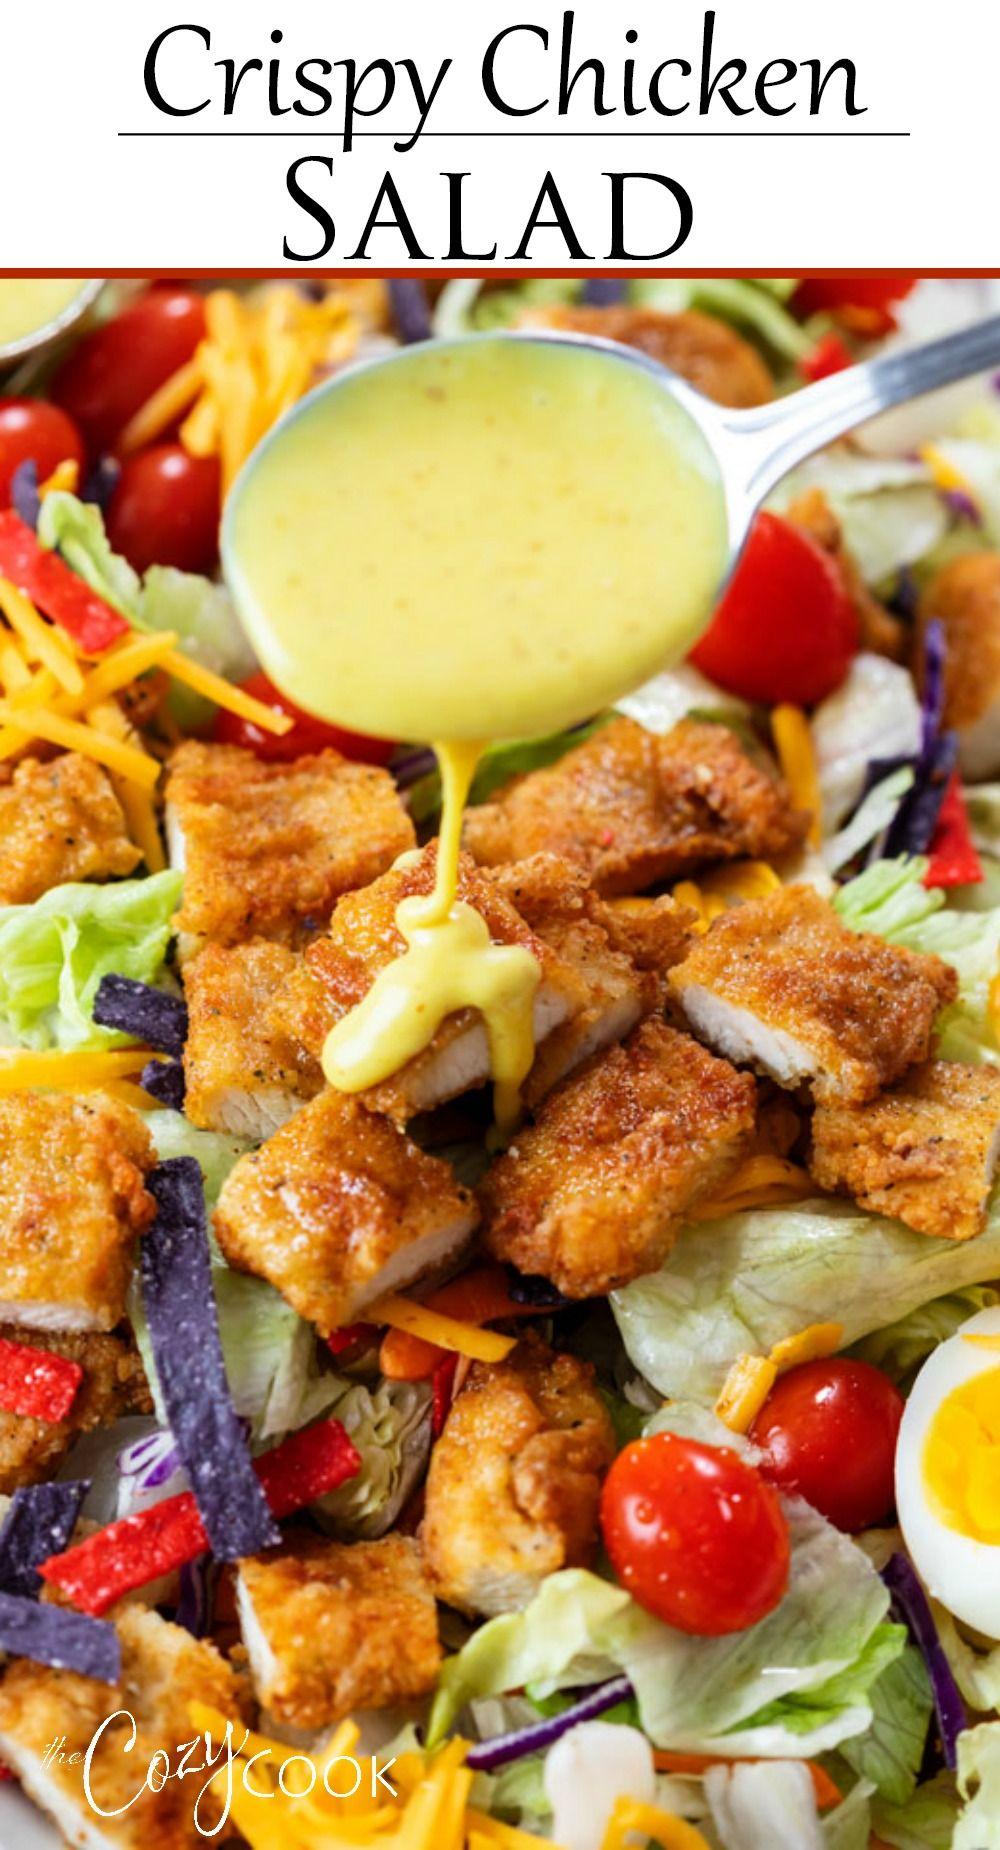 Crispy Chicken Salad Crispy Chicken Salads Healthy Salad Recipes Healthy Eating Choices